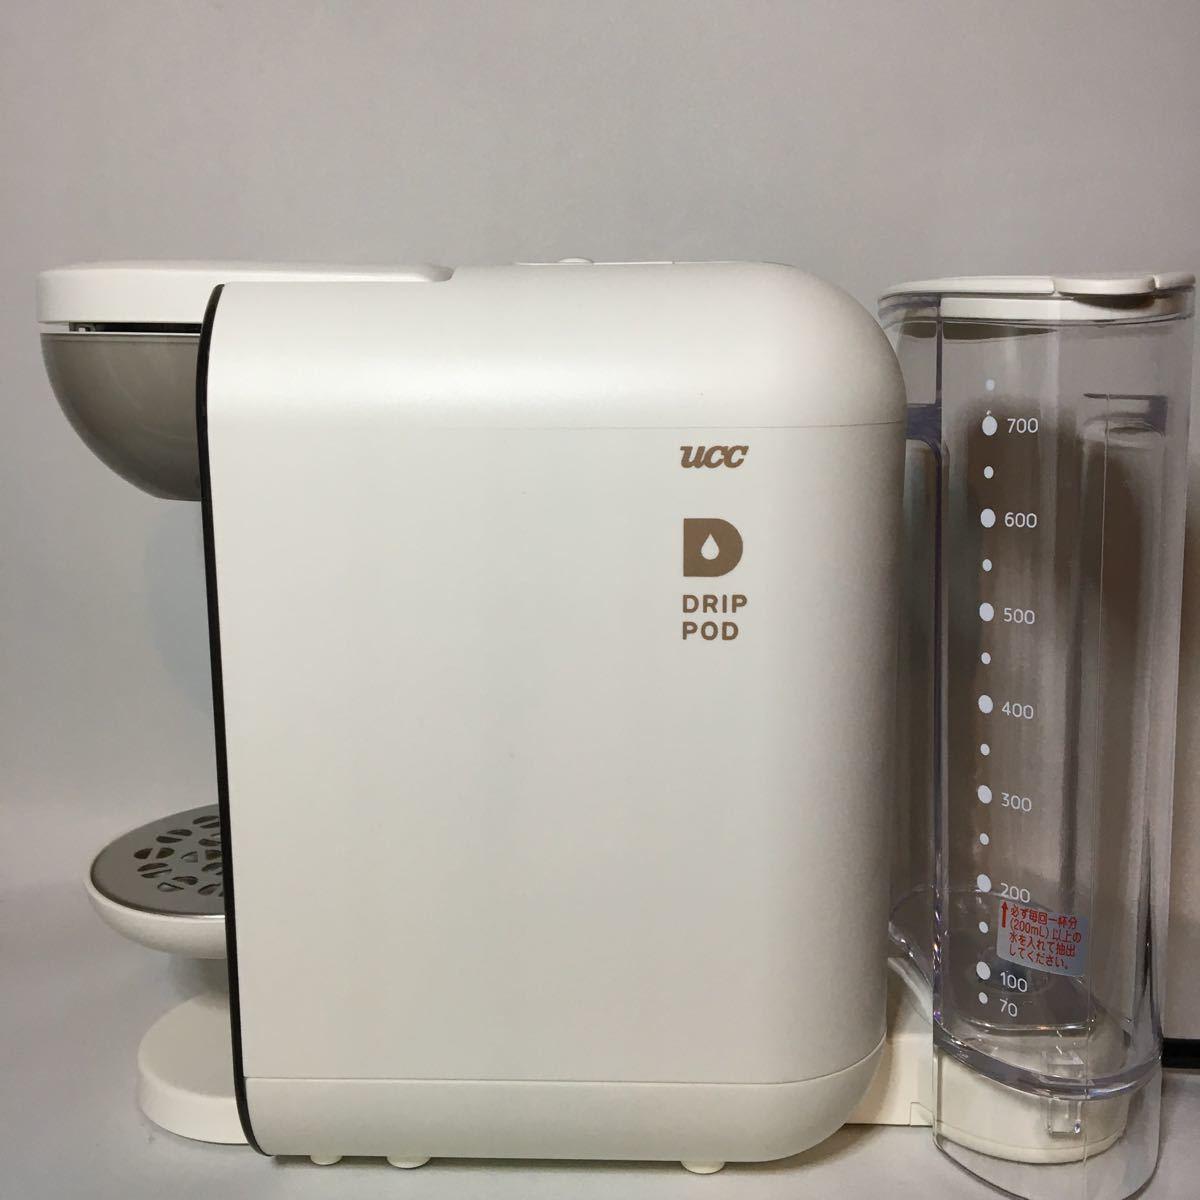 UCC上島珈琲 UCCドリップポッド DP2 コーヒーメーカー